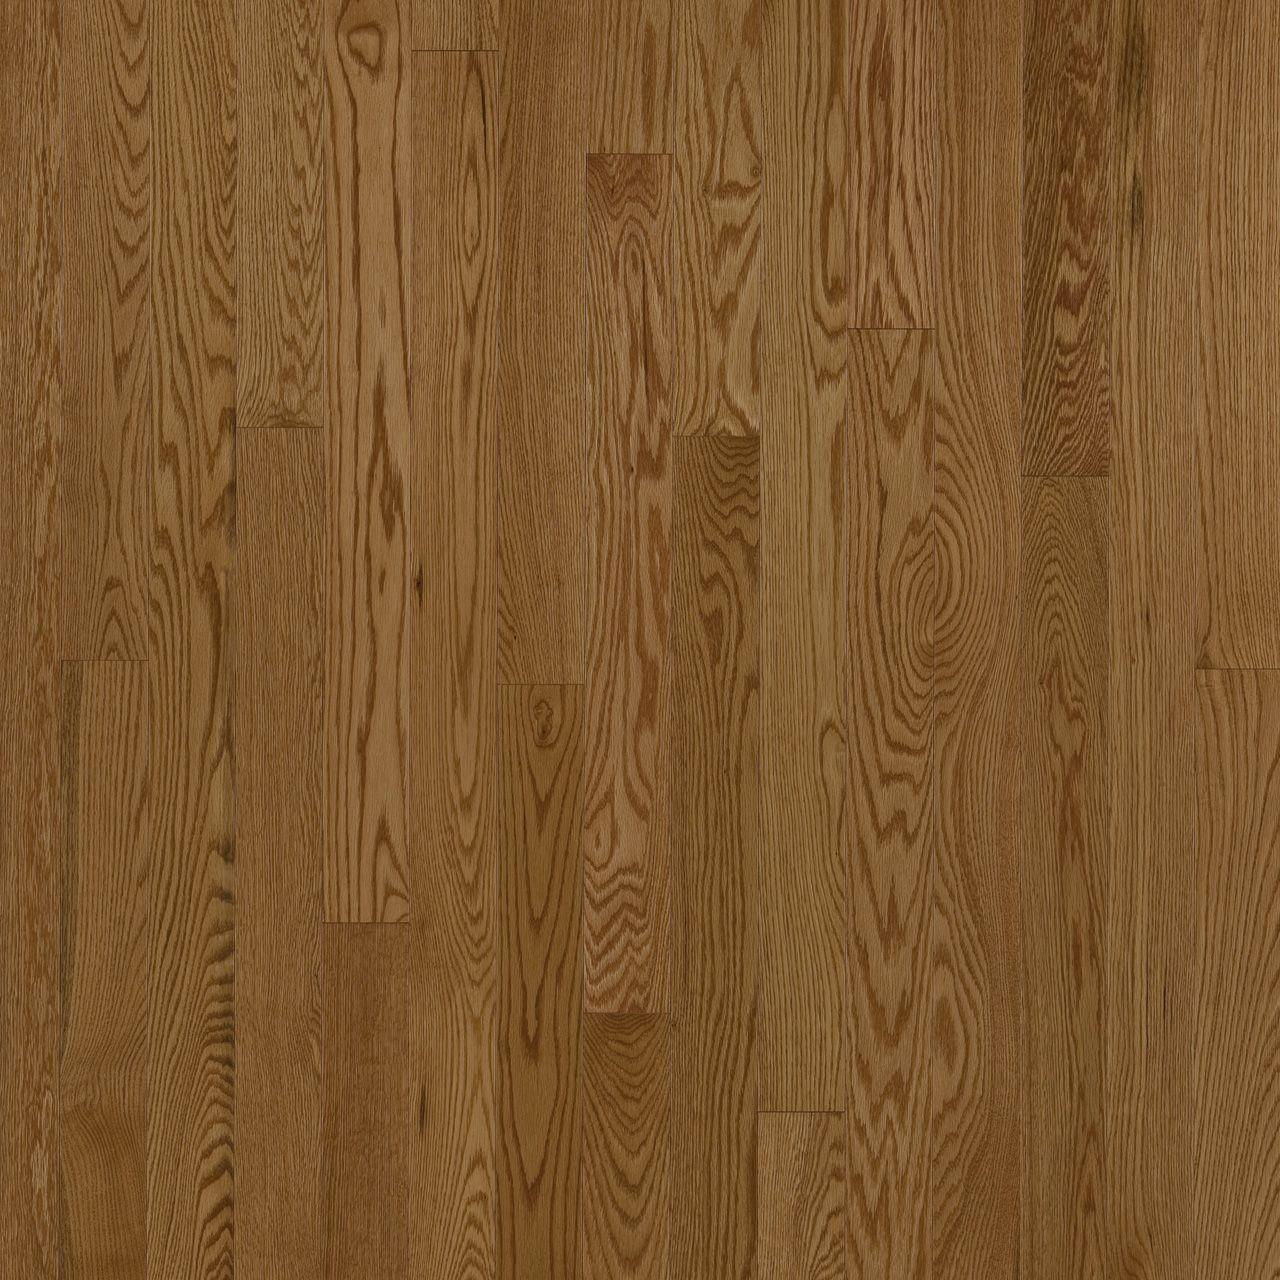 model hardwood flooring canada of red oak honey hardwood flooring preverco preverco hardwood for red oak honey hardwood flooring preverco